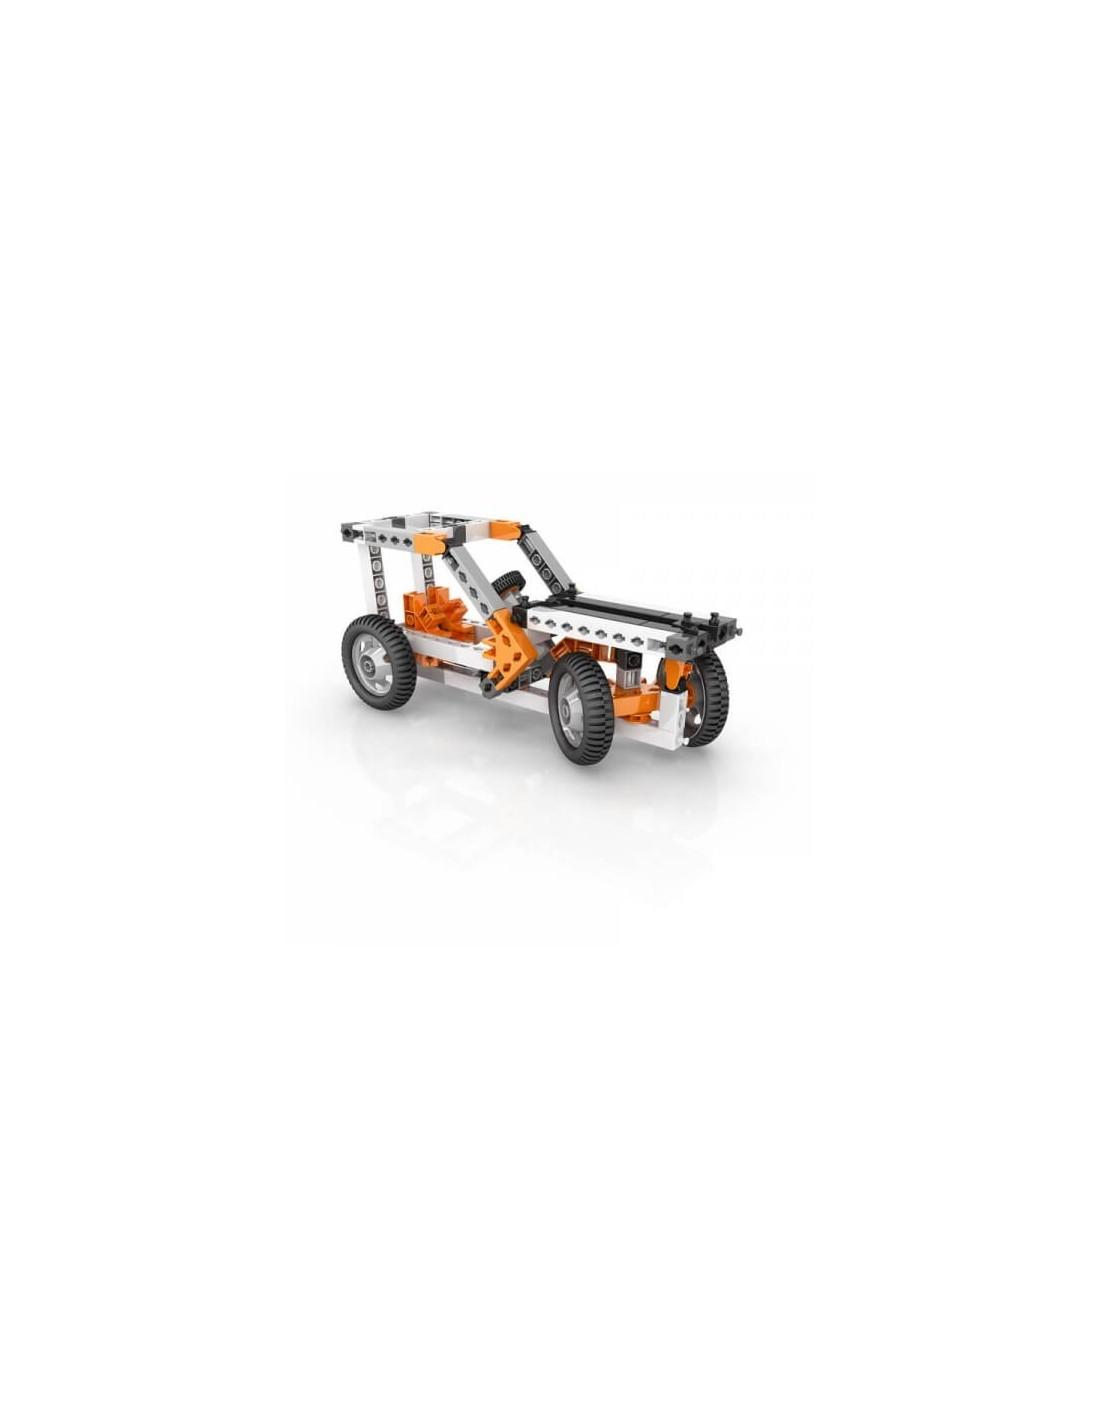 Set de constructie - STEM Wheels, Axles and Inclined Planes | Engino - 5